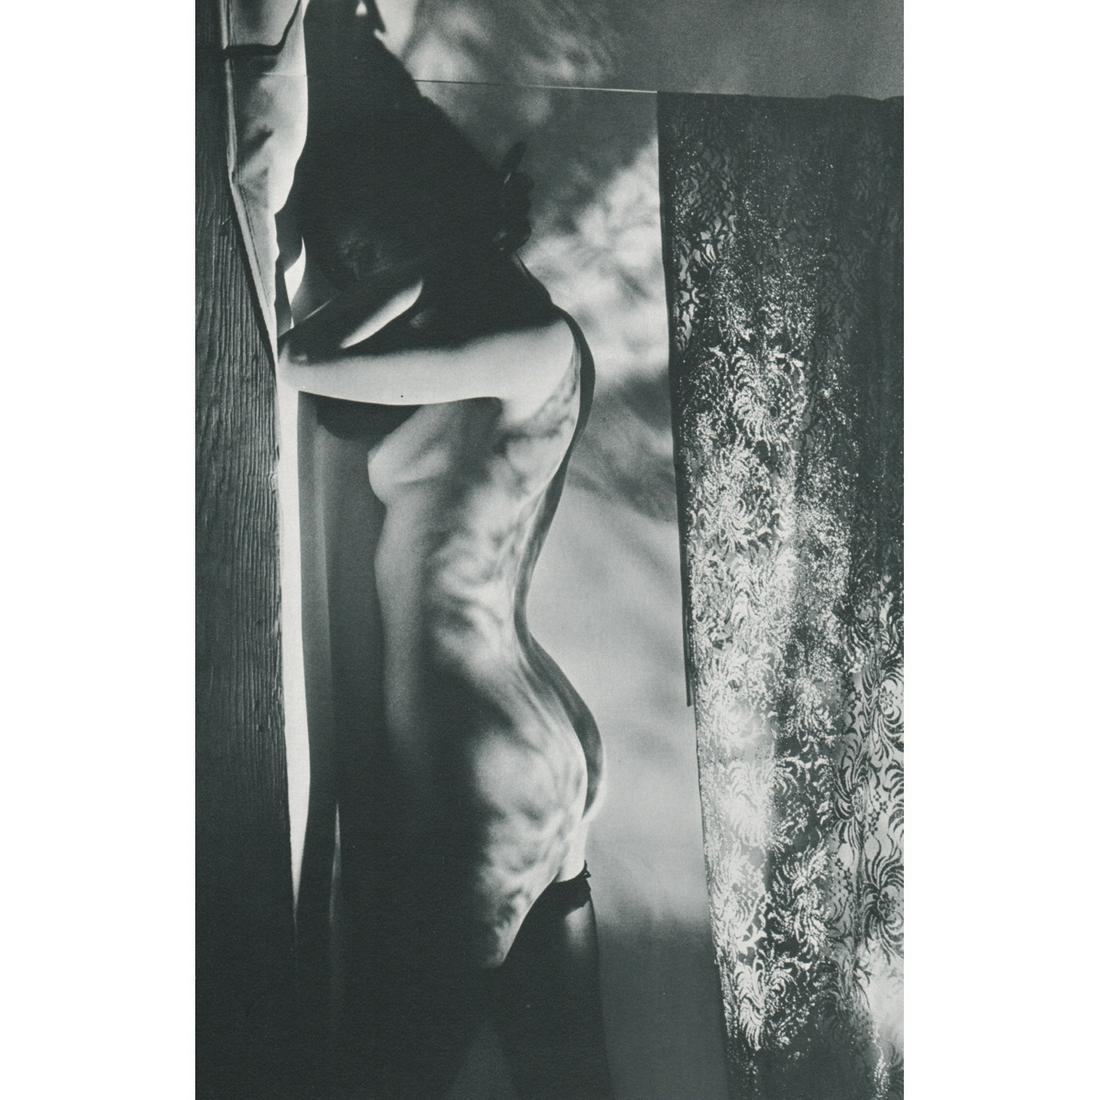 KEIICHI TAHARA - Nude